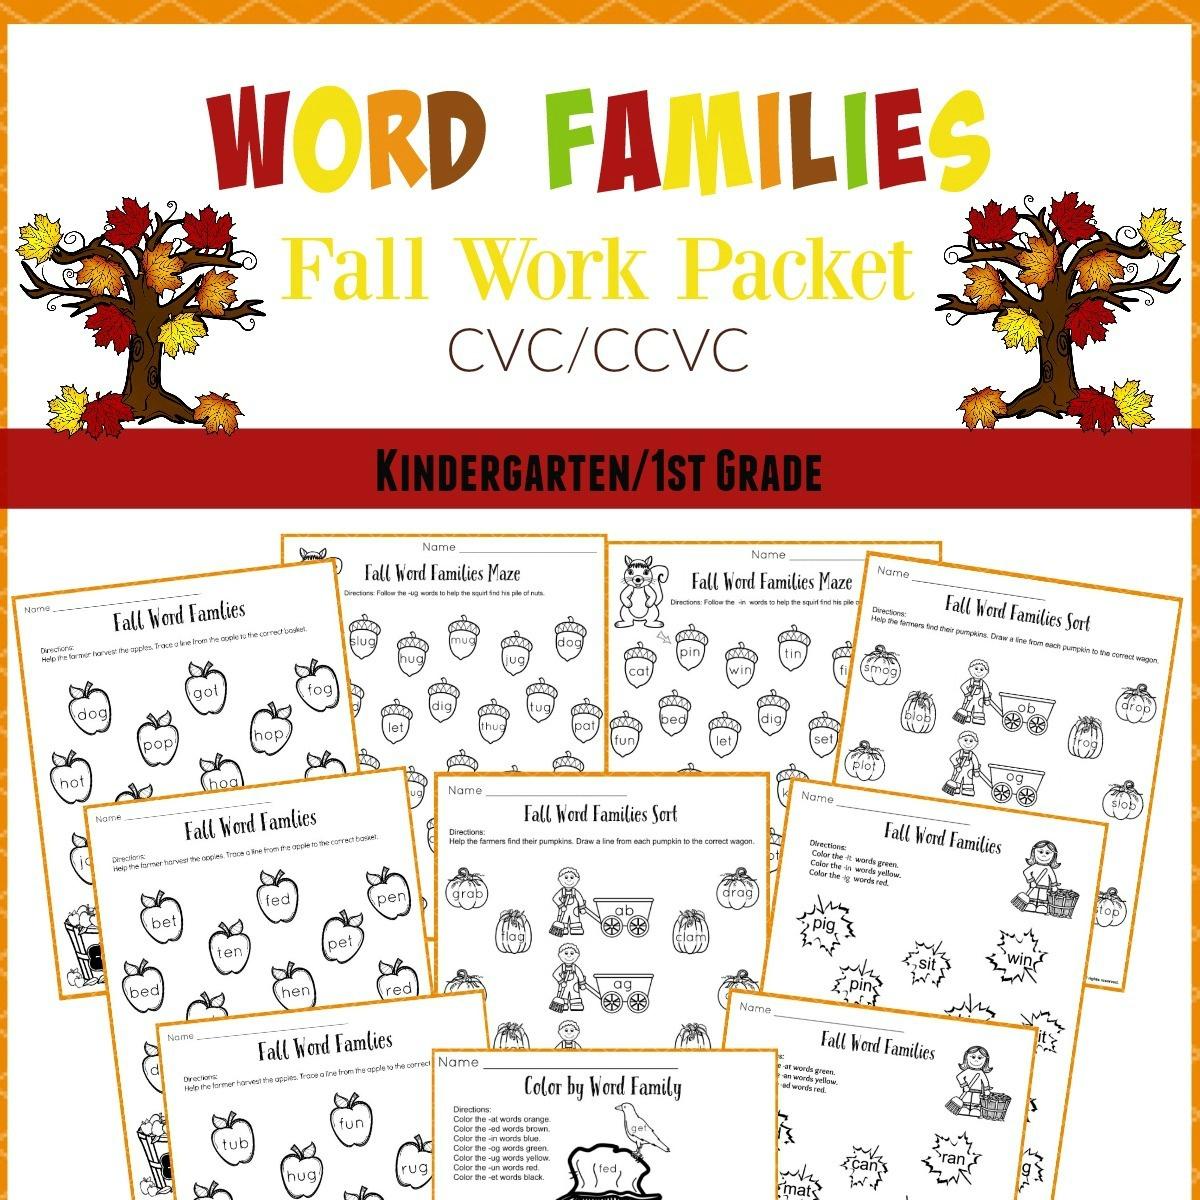 Fall Word Families Worksheets For Kindergarten Or 1St Grade - Free Printable Word Family Worksheets For Kindergarten